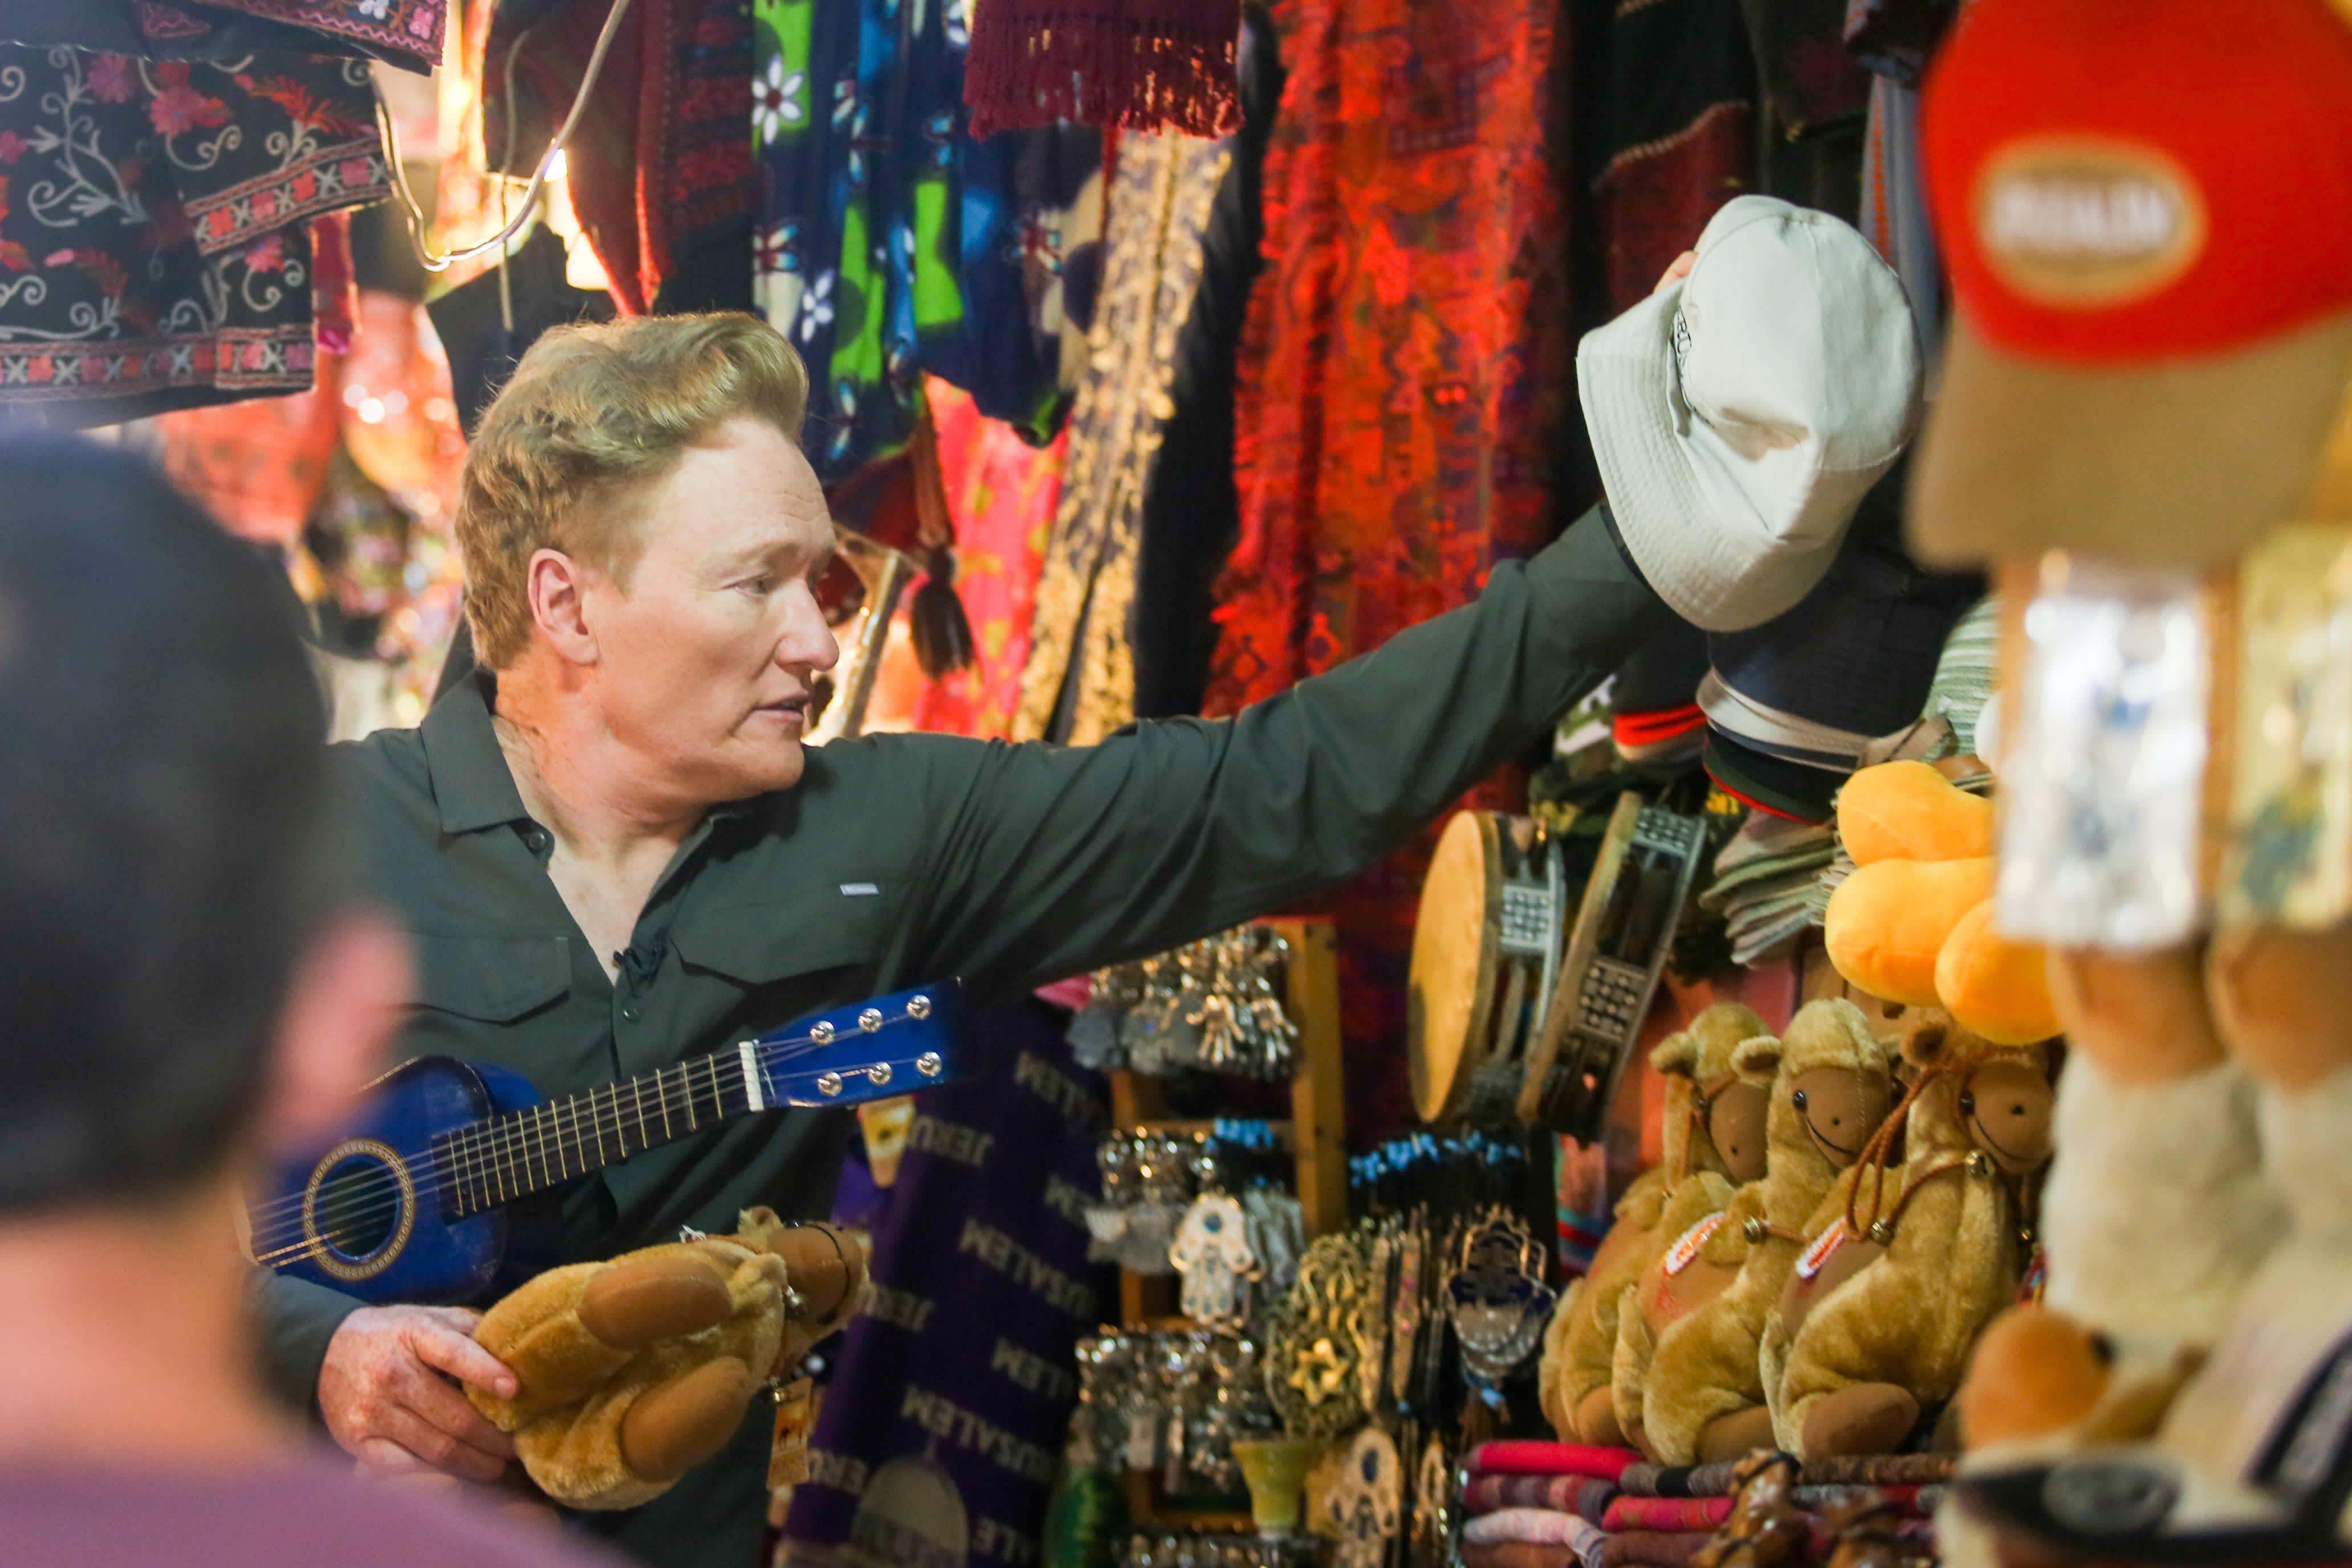 Conan O'Brien shops in the market in Jerusalem (MARC ISRAEL SELLEM/THE JERUSALEM POST)